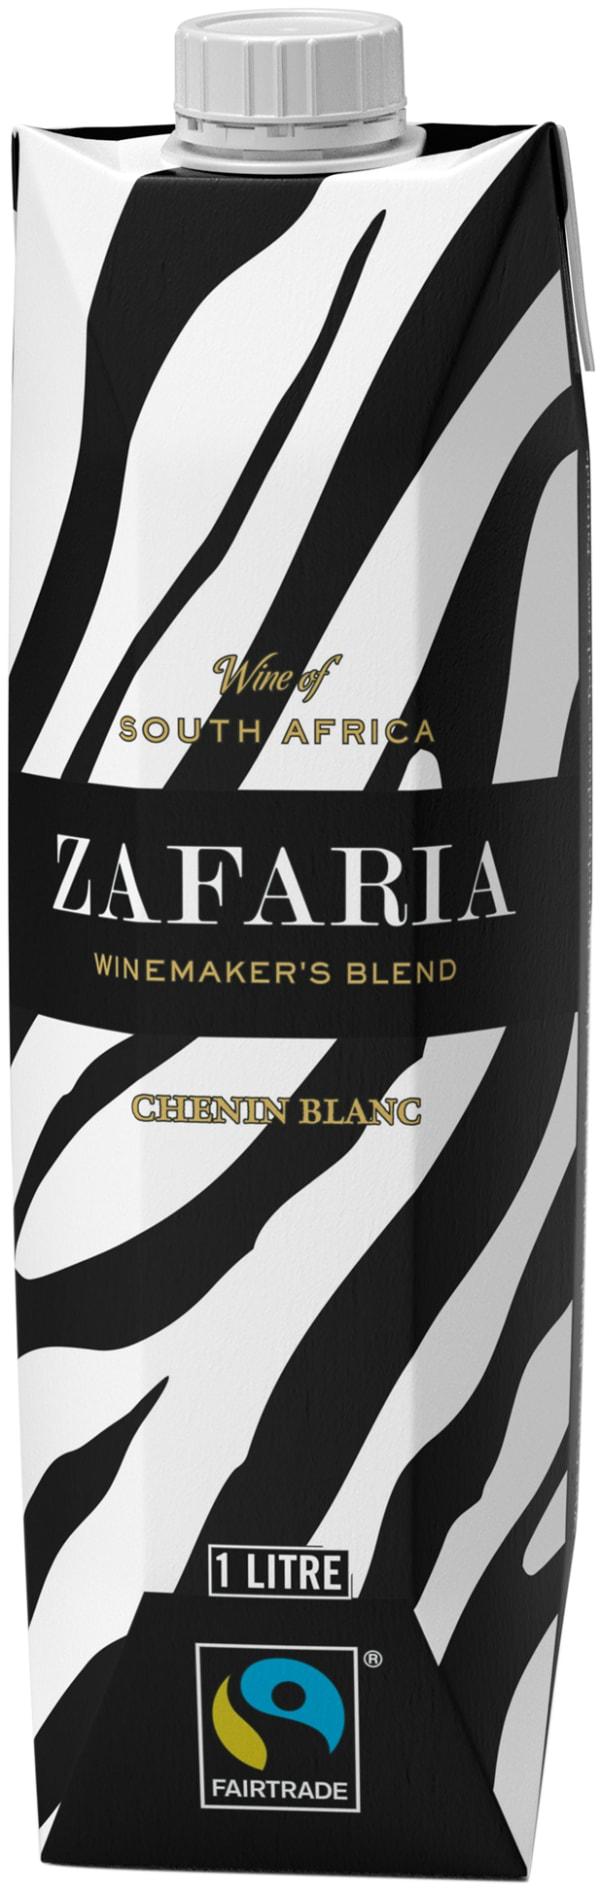 Zafaria Winemakers Blend Chenin Blanc 2017 carton package